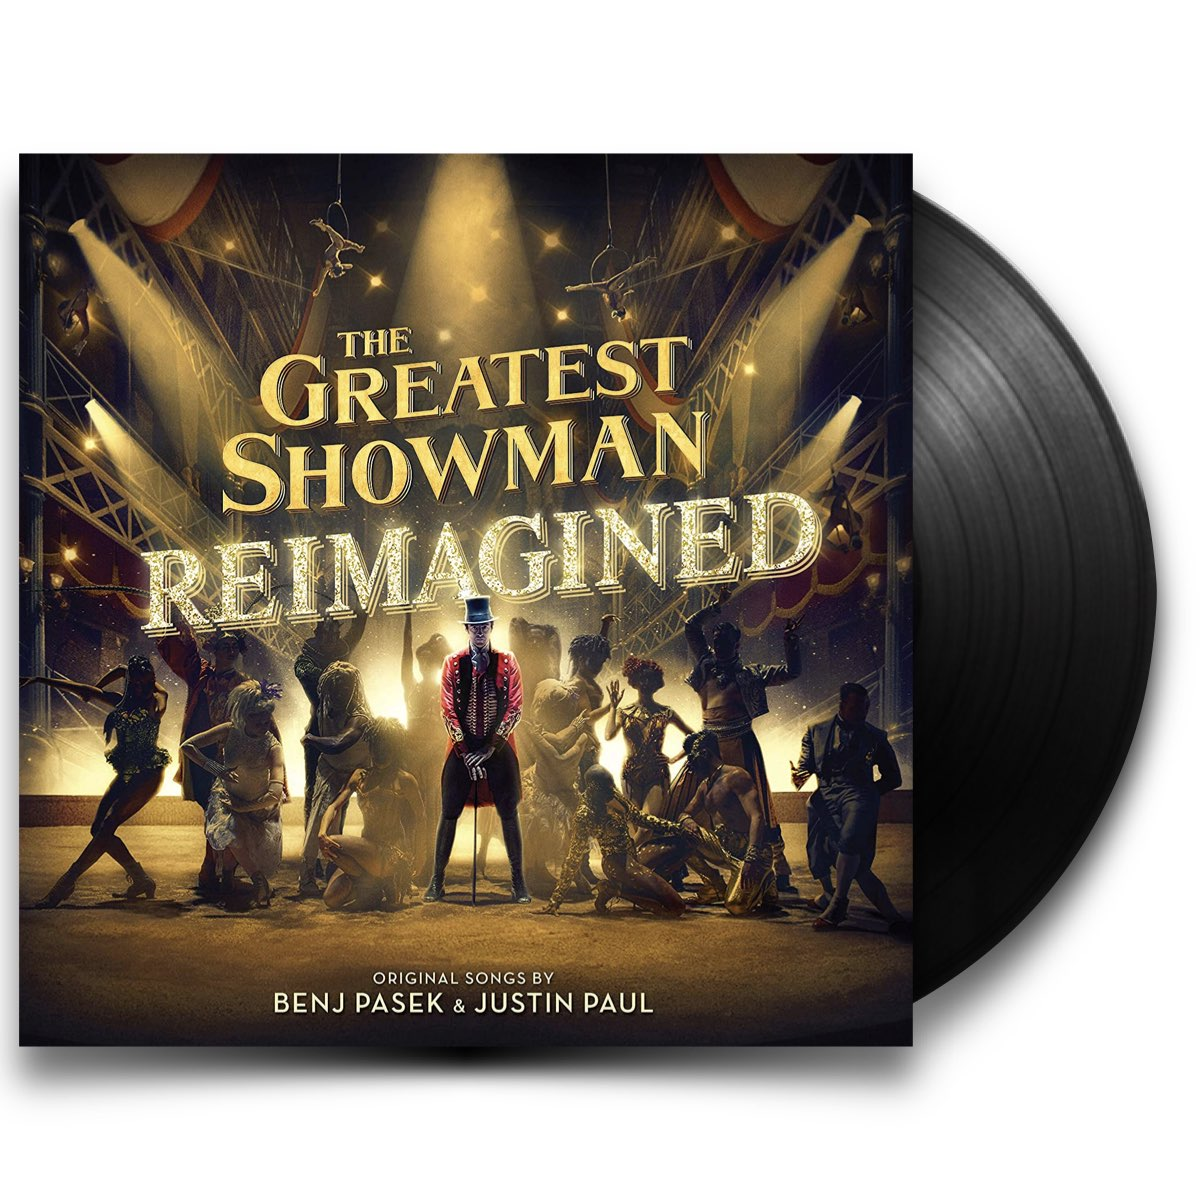 The Greatest Showman - Reimagined [Black Vinyl]